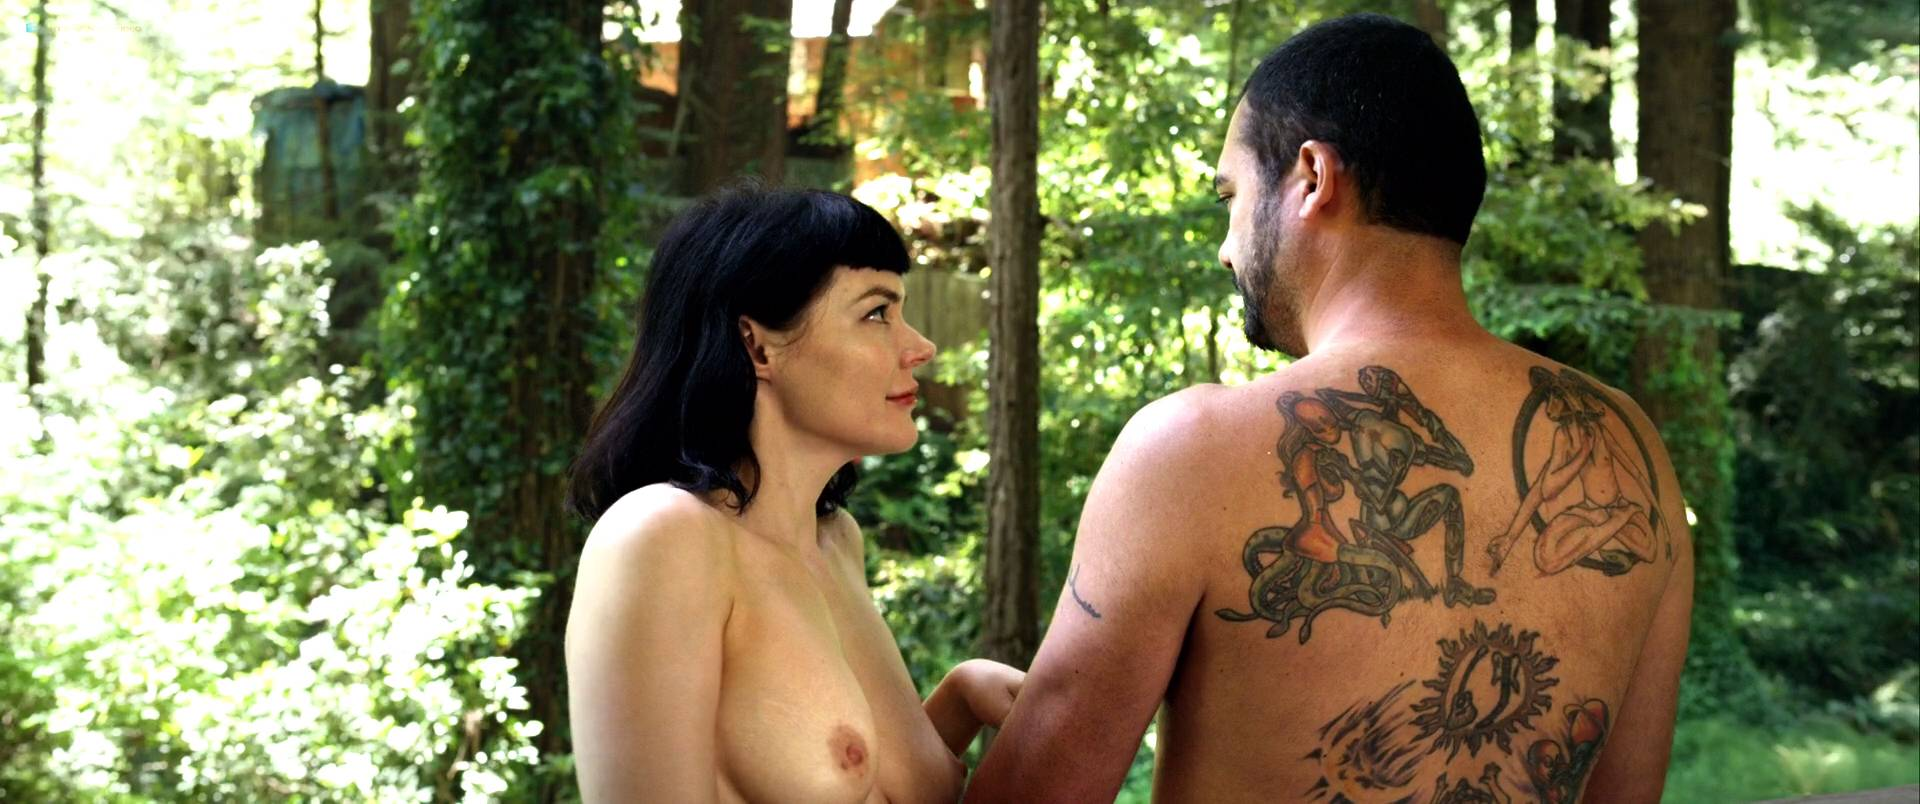 Liz Claire nude full frontal - Live or Die in La Honda (2017) HD 1080p WEB (2)